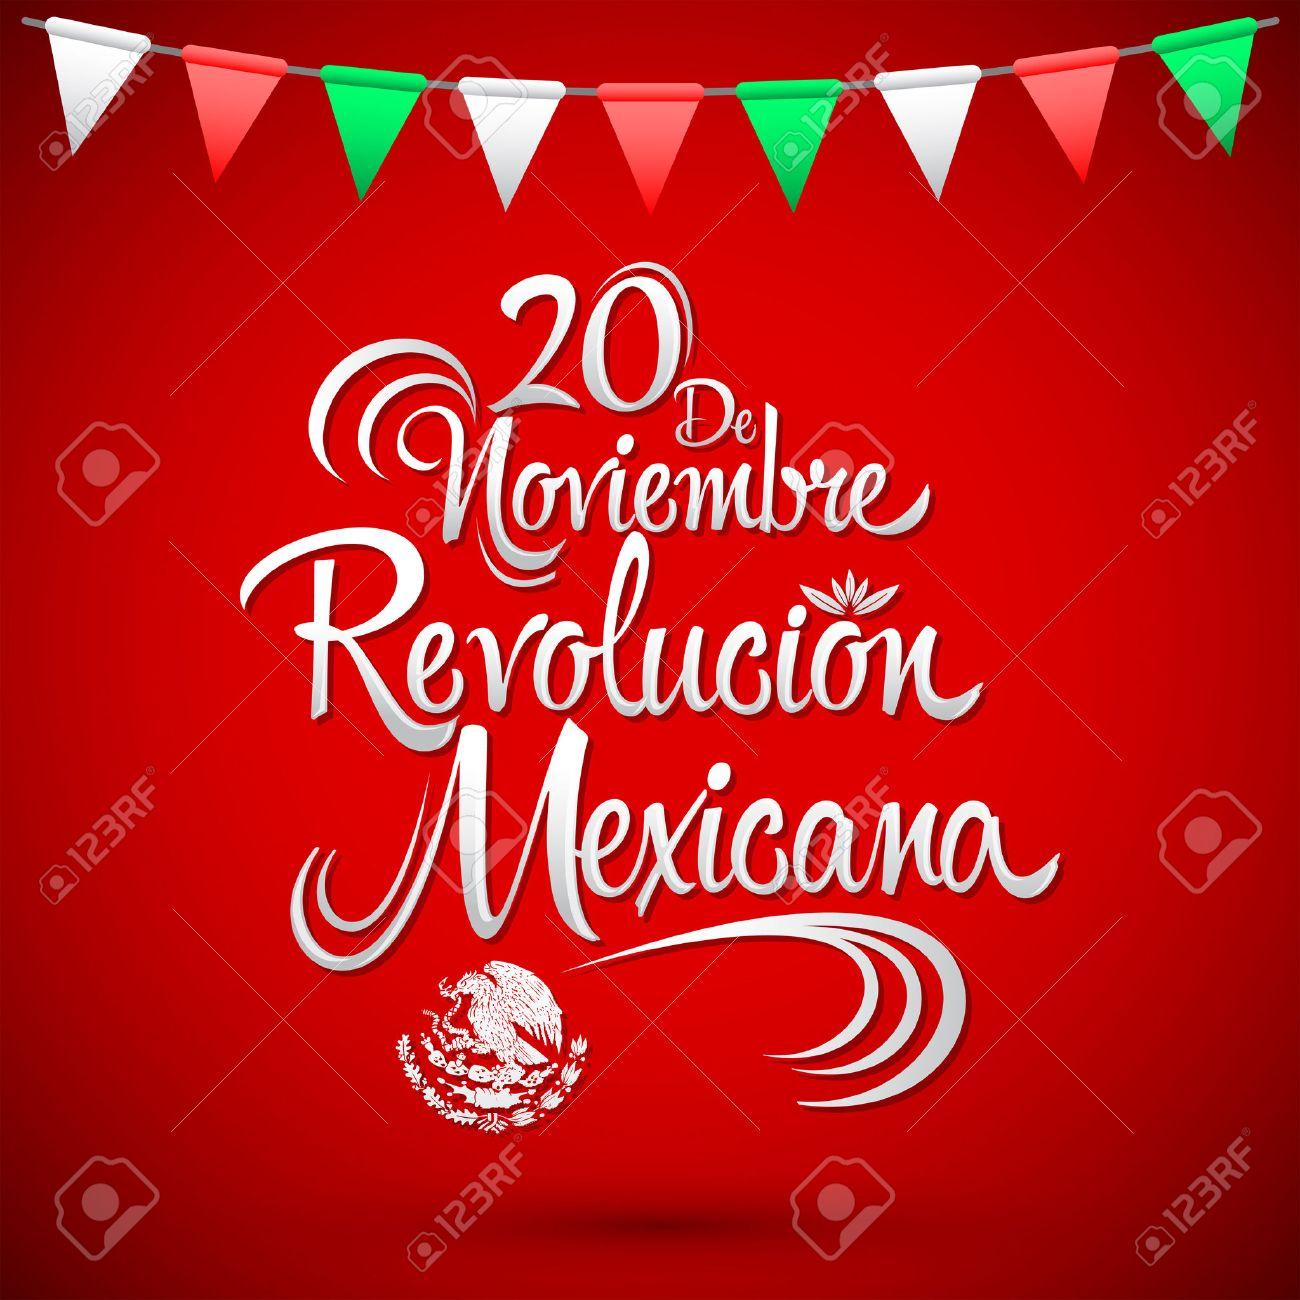 20 de Noviembre Revolucion Mexicana - November 20 Mexican Revolution Spanish text, vector lettering design, Traditional mexican Holiday - 48097245